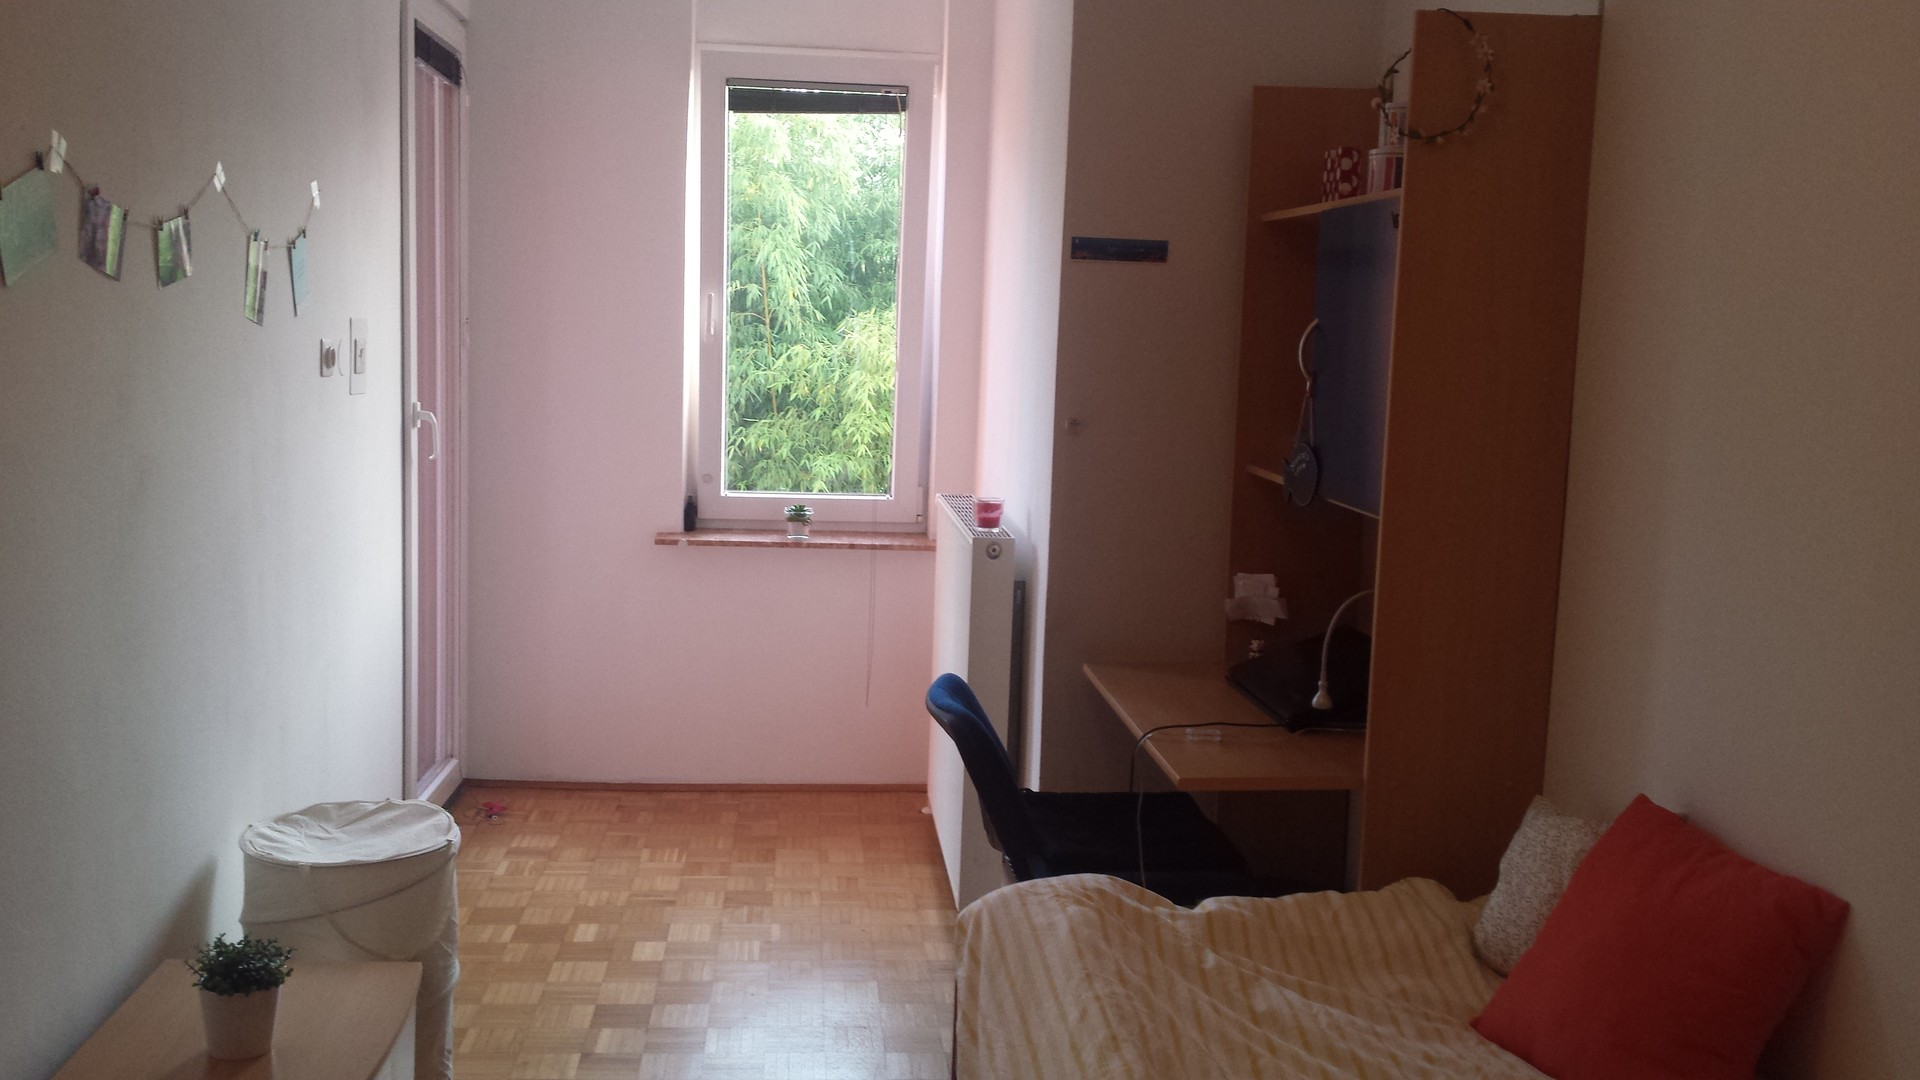 Your home in Ljubljana - single room with balcony